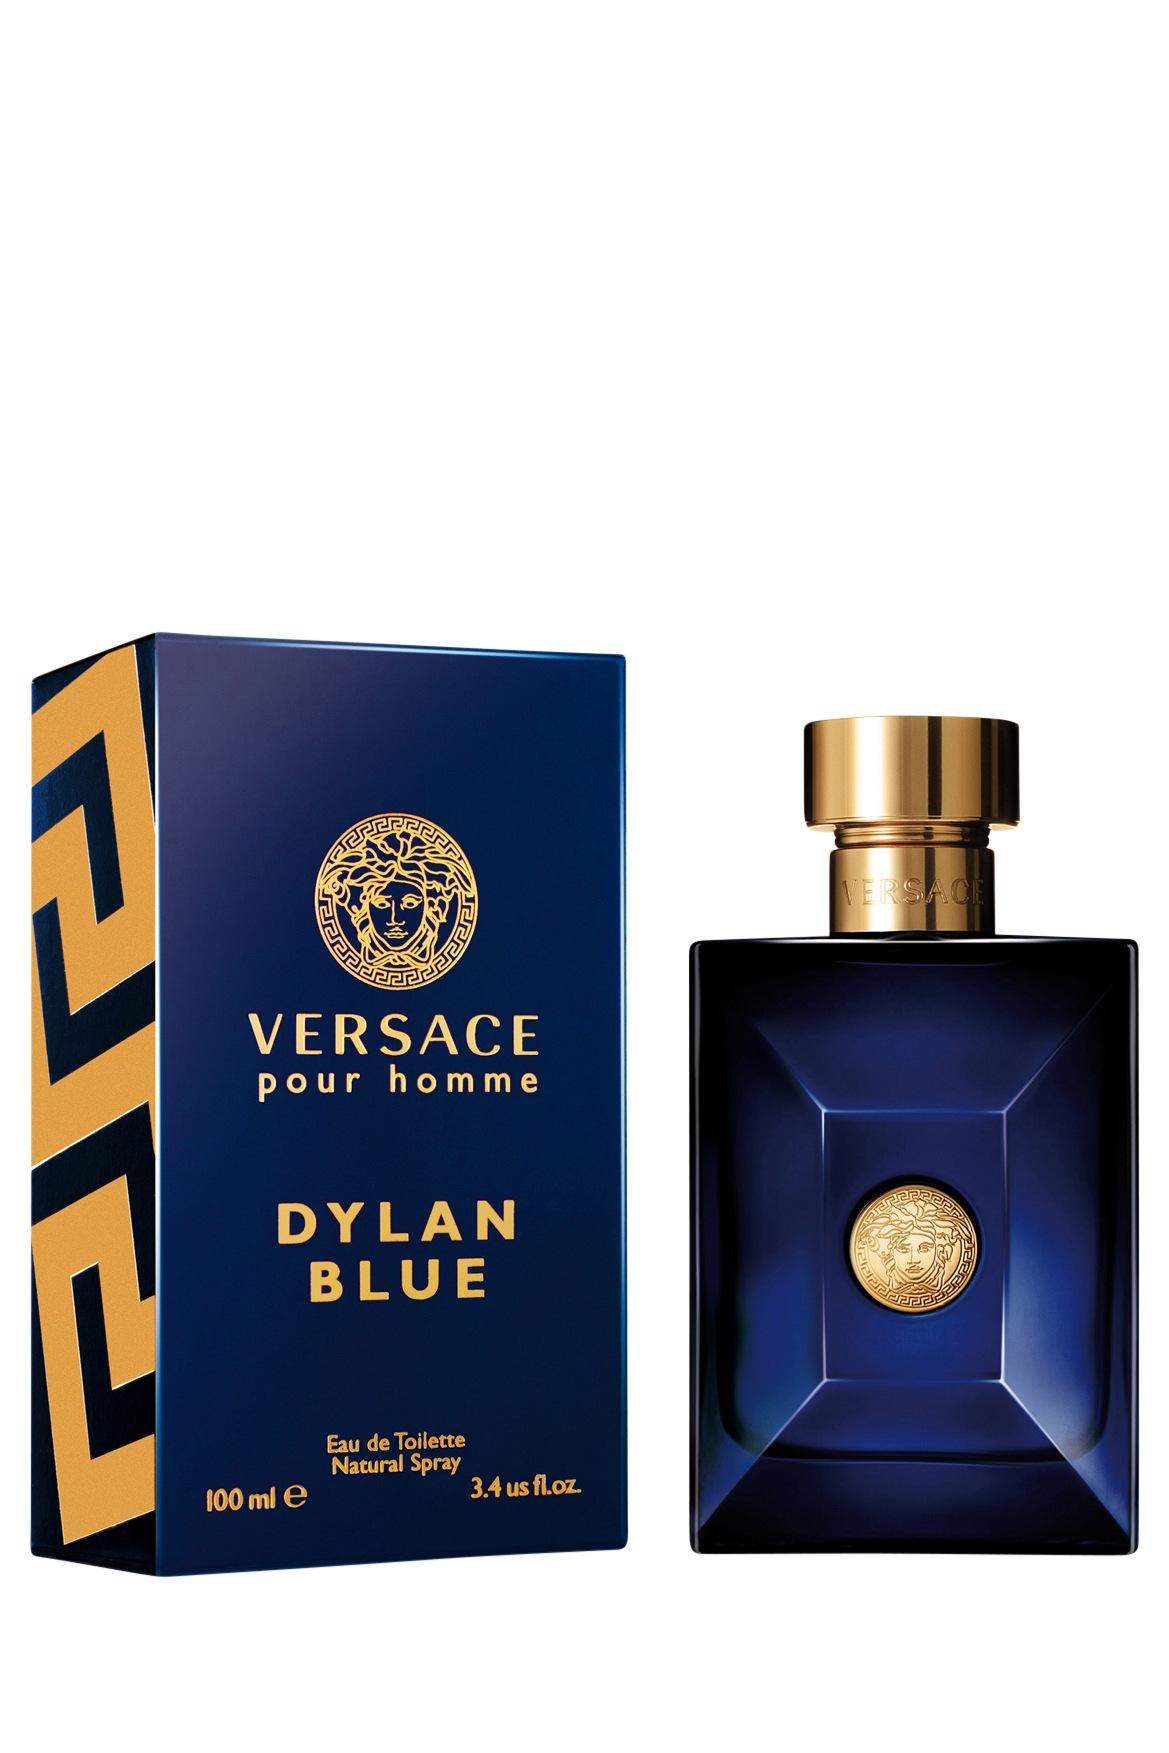 versace dylan blue edt myer online myer online category